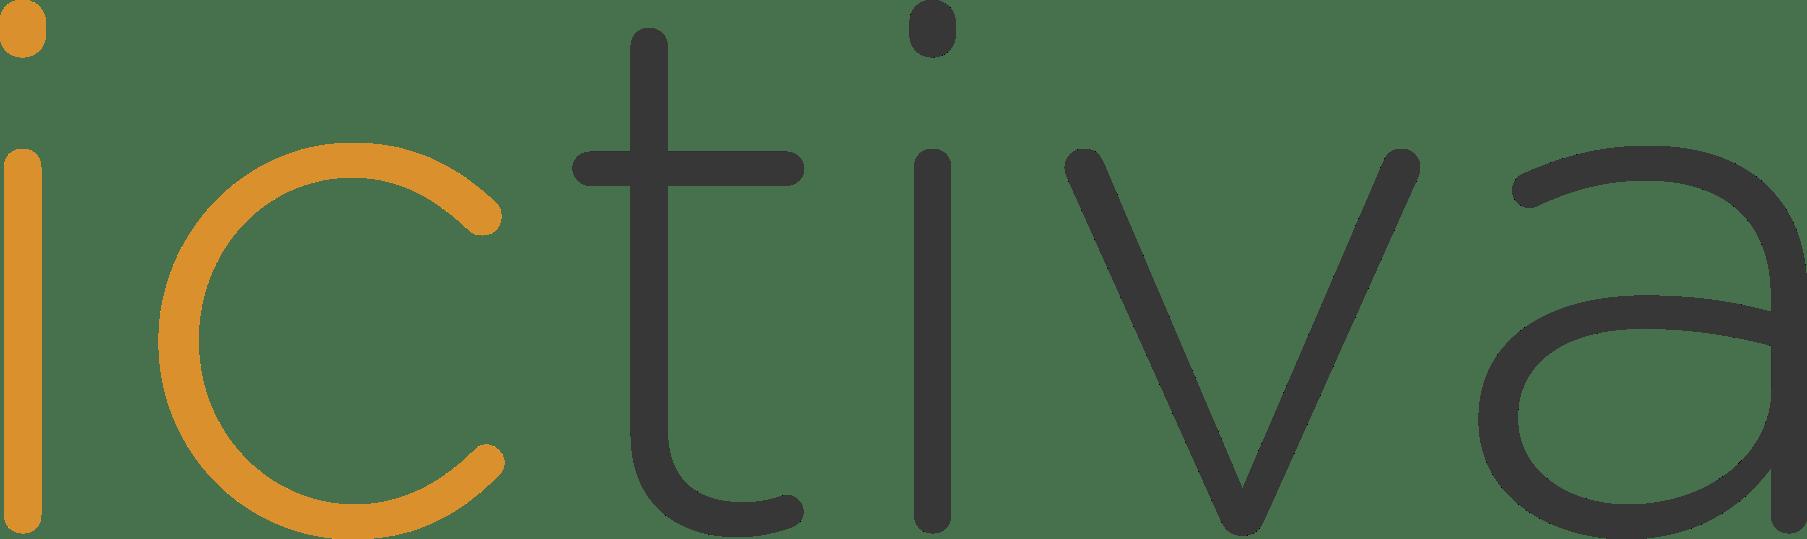 Ictiva logo